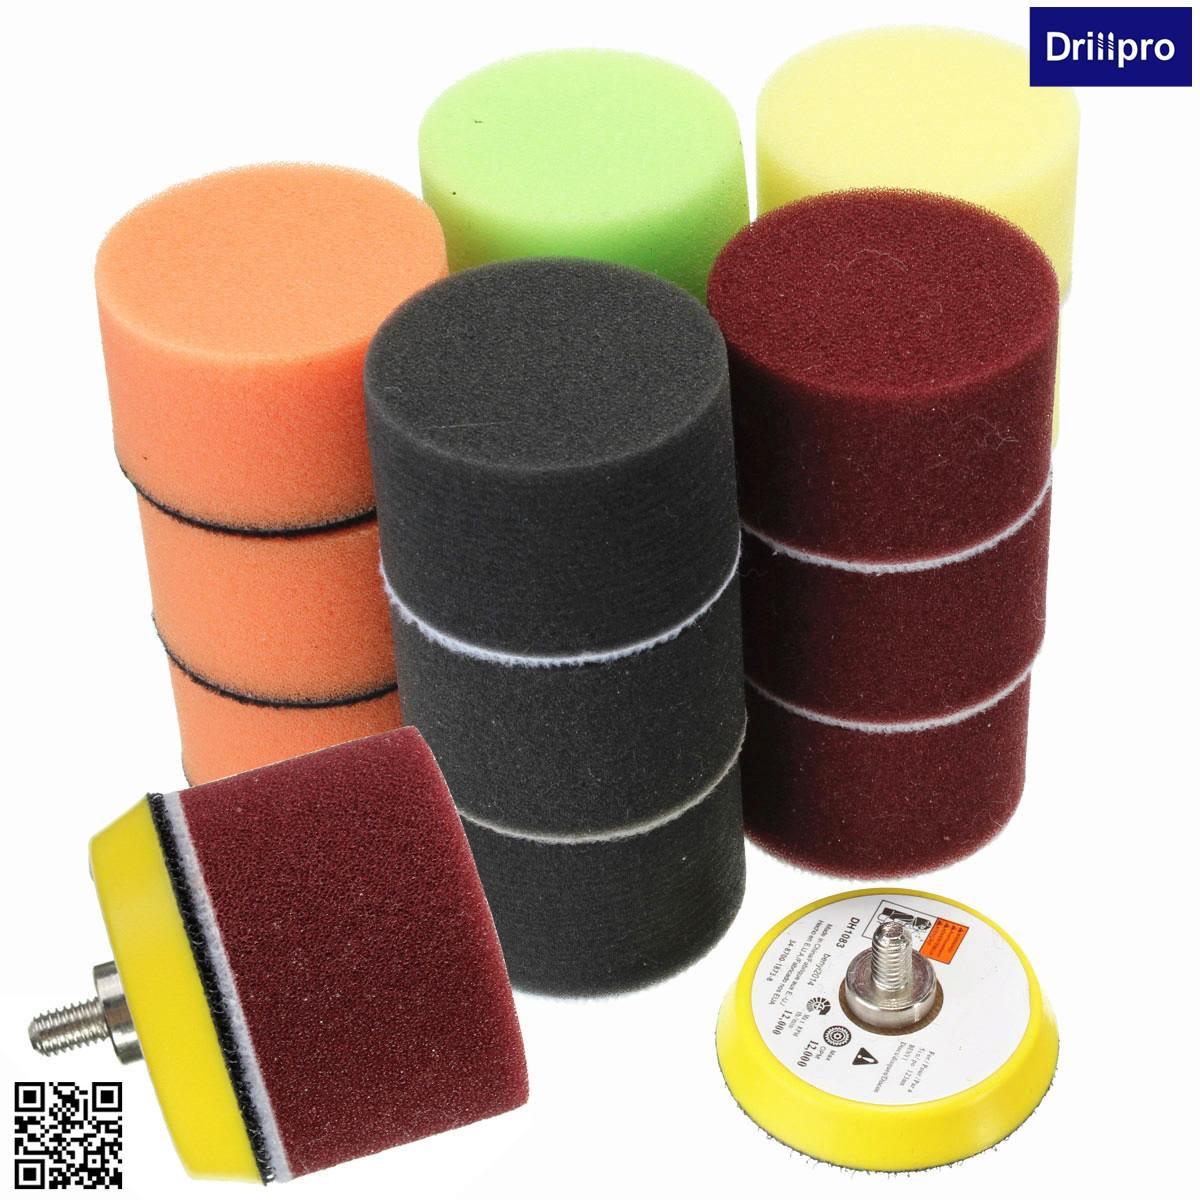 Drillpro 16pcs 2 Inch Sponge Flat Polishing Pad For Car Polisher